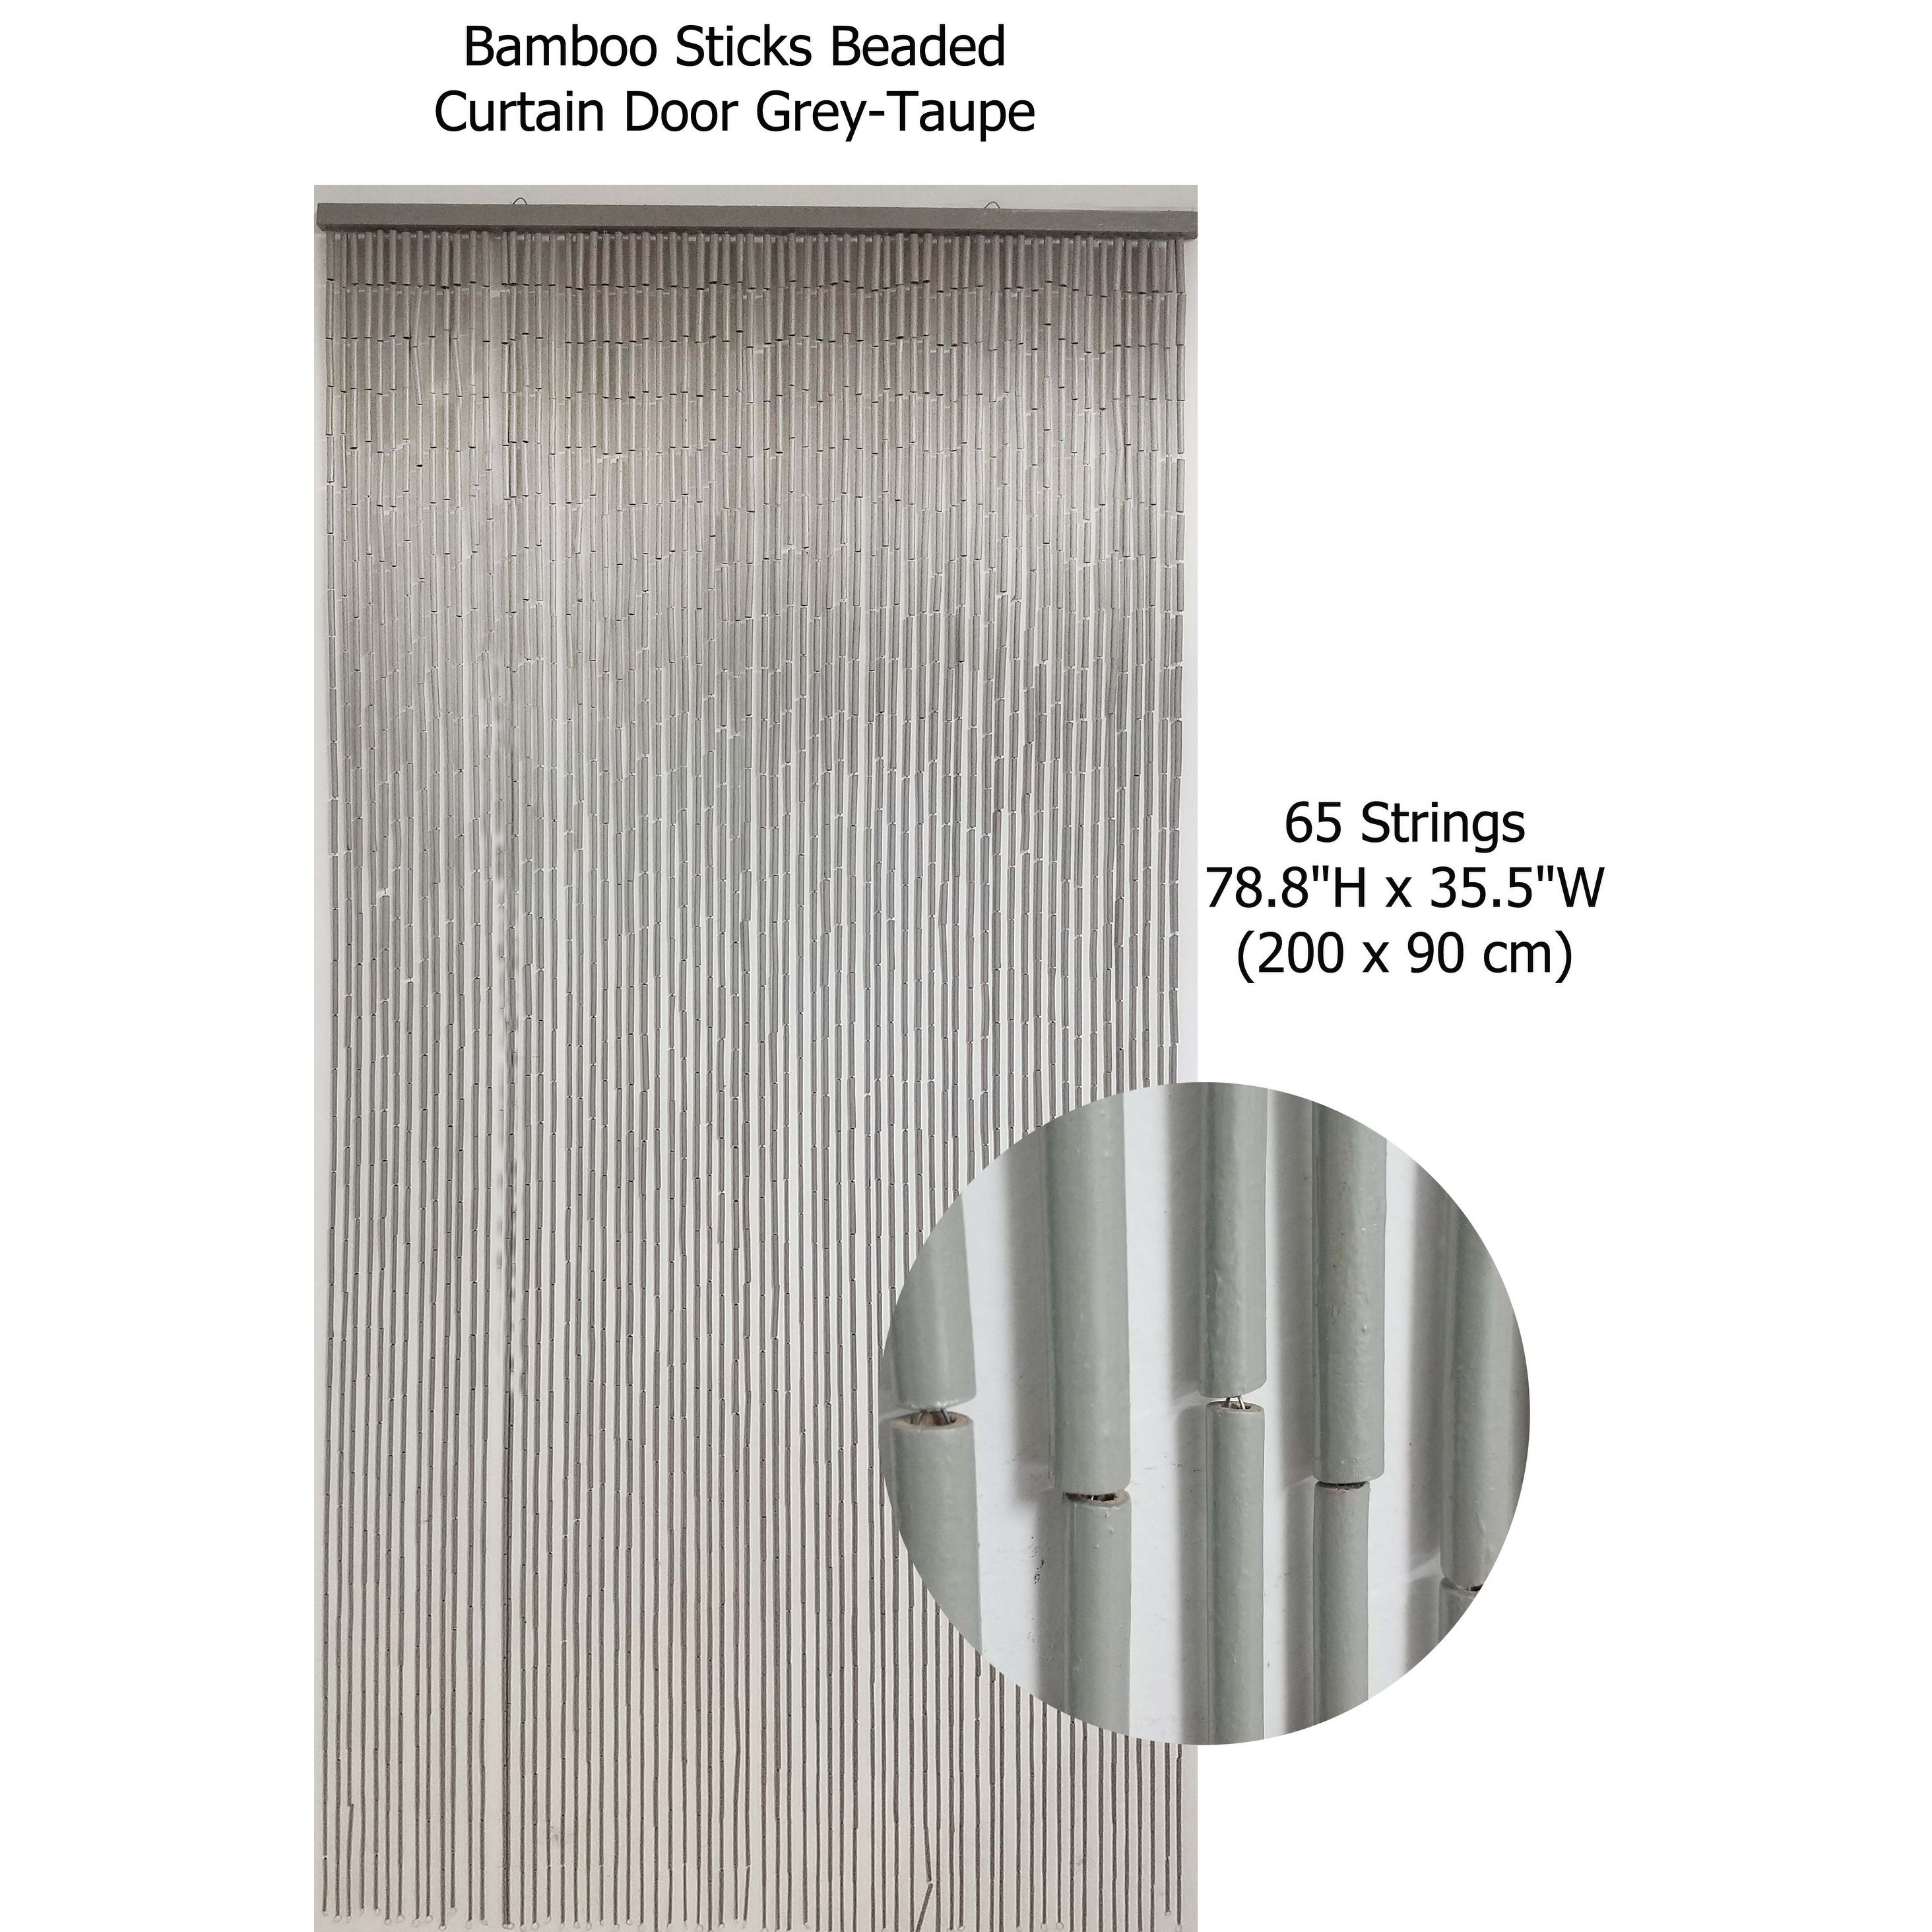 Bamboo Sticks Beaded Curtain Doorway 65 Strings 78 8 H X 35 5 W 78 8h X 35 5 Inch 200x90 Cm 78 8h X 35 5 Inch 200x90 Cm Overstock 23001251